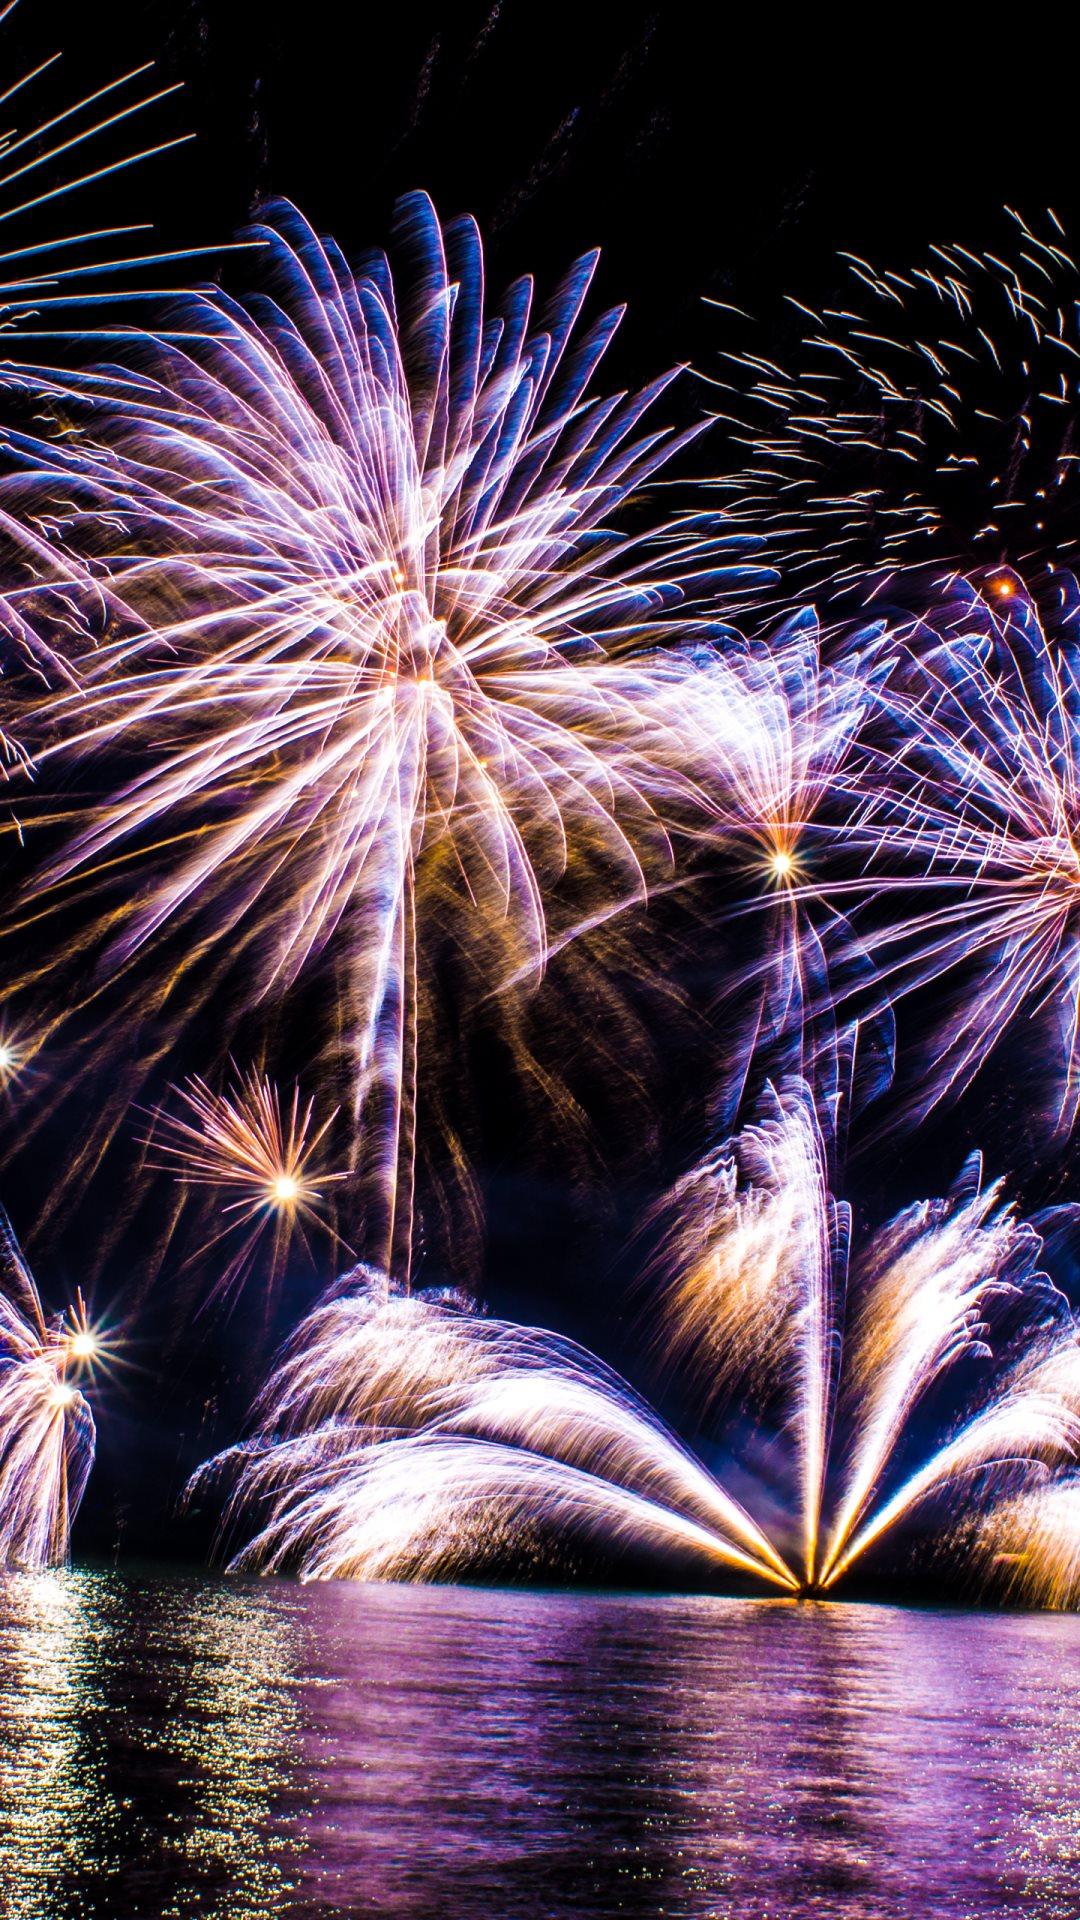 4k fireworks wallpapers high quality download free - 4k wallpaper download ...